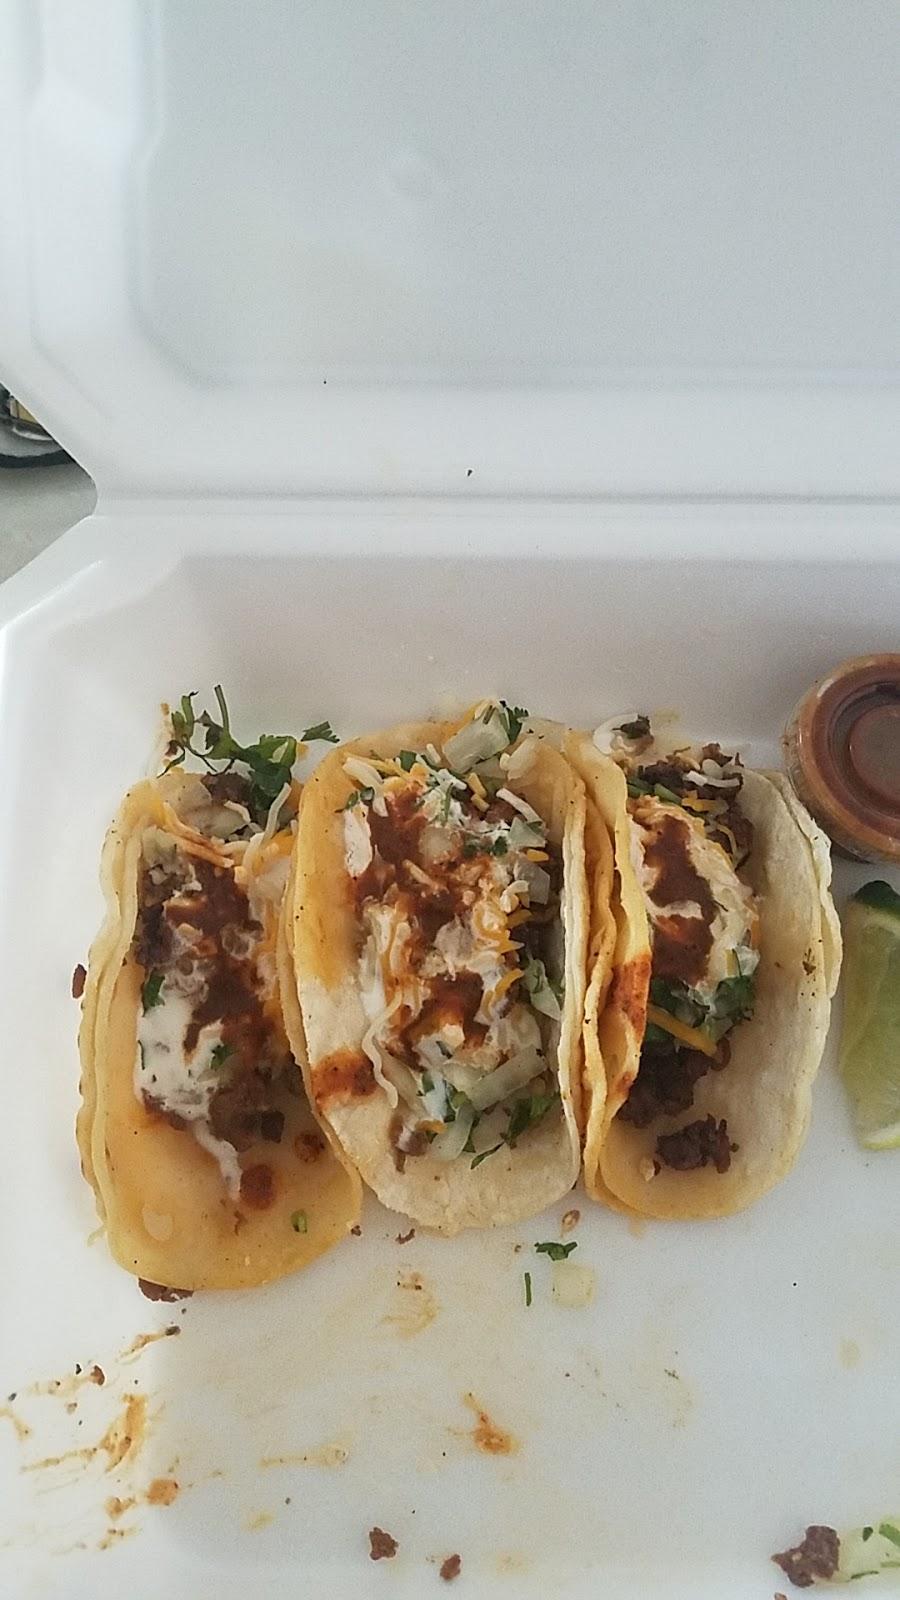 Fairfield Taqueria - restaurant  | Photo 1 of 2 | Address: 1247 Texas St, Fairfield, CA 94533, USA | Phone: (707) 430-8640